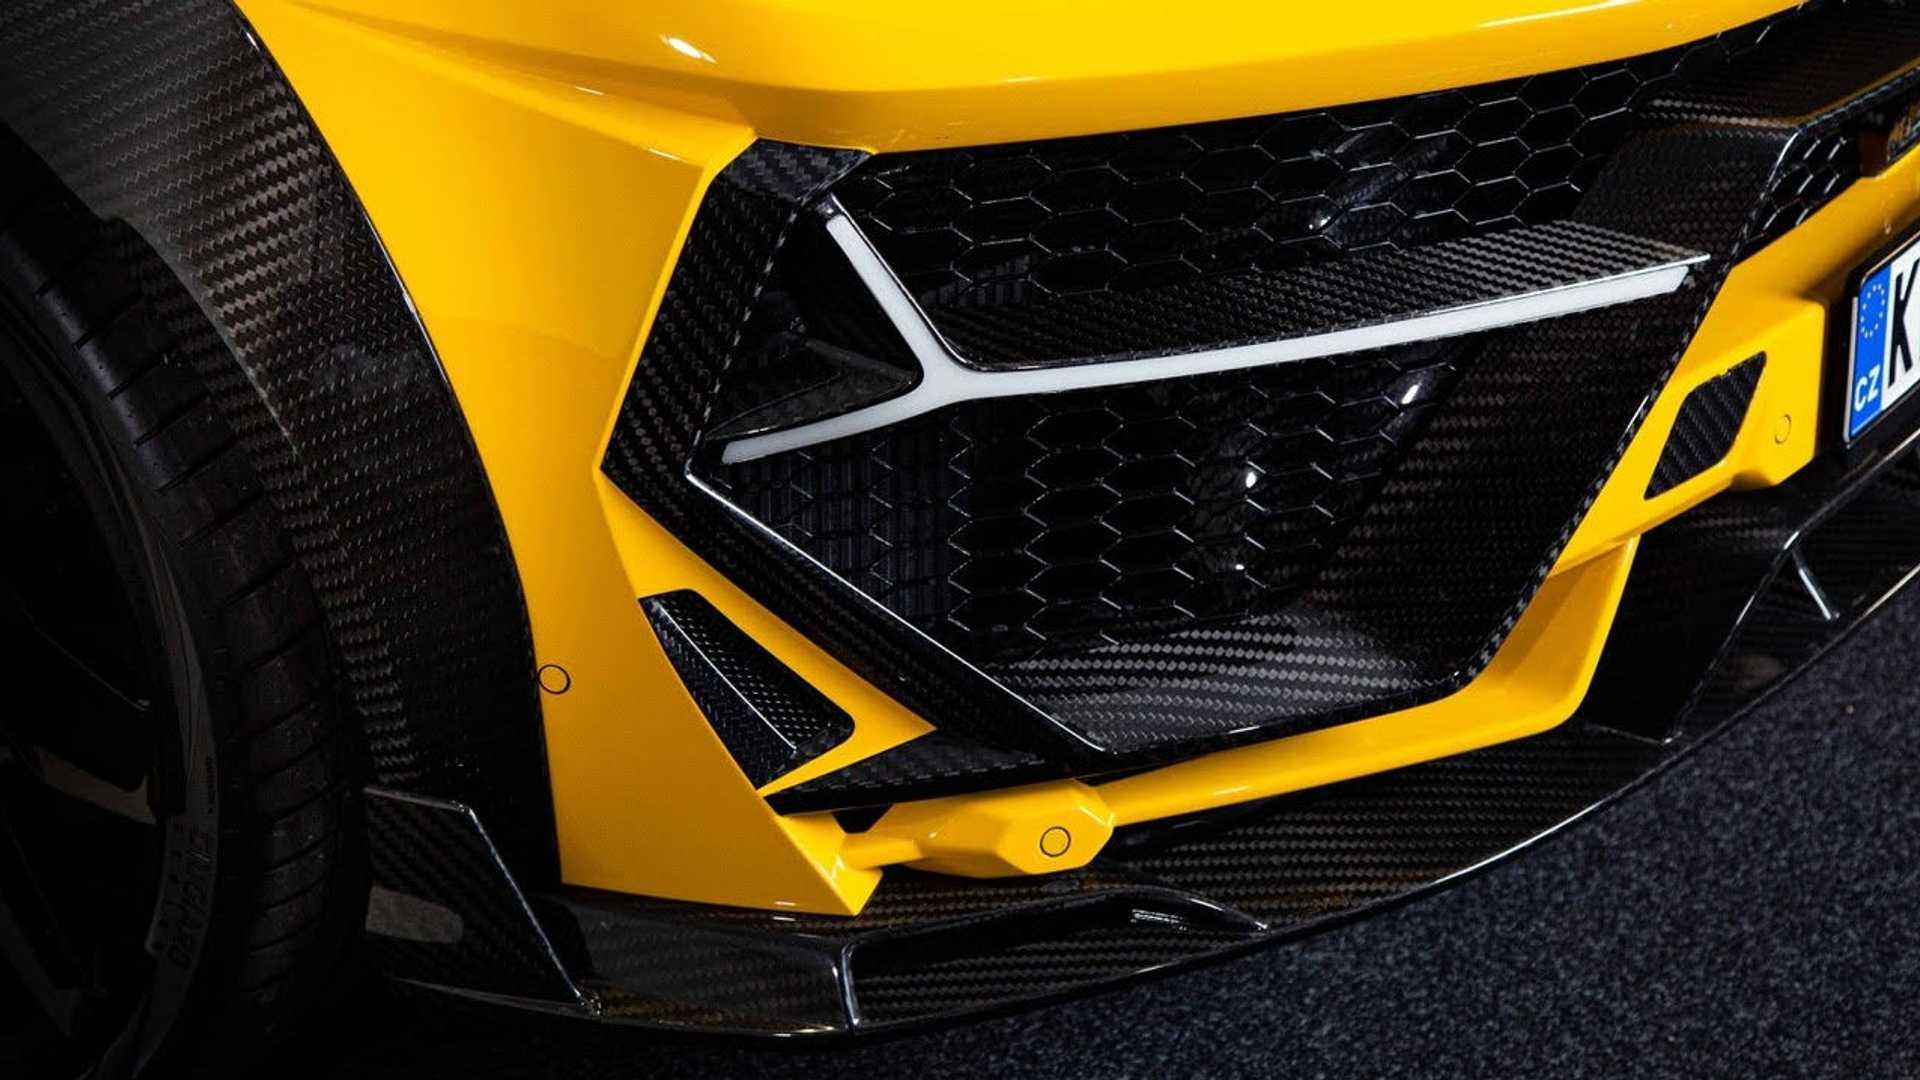 Lamborghini-Urus-by-Keyvany-10